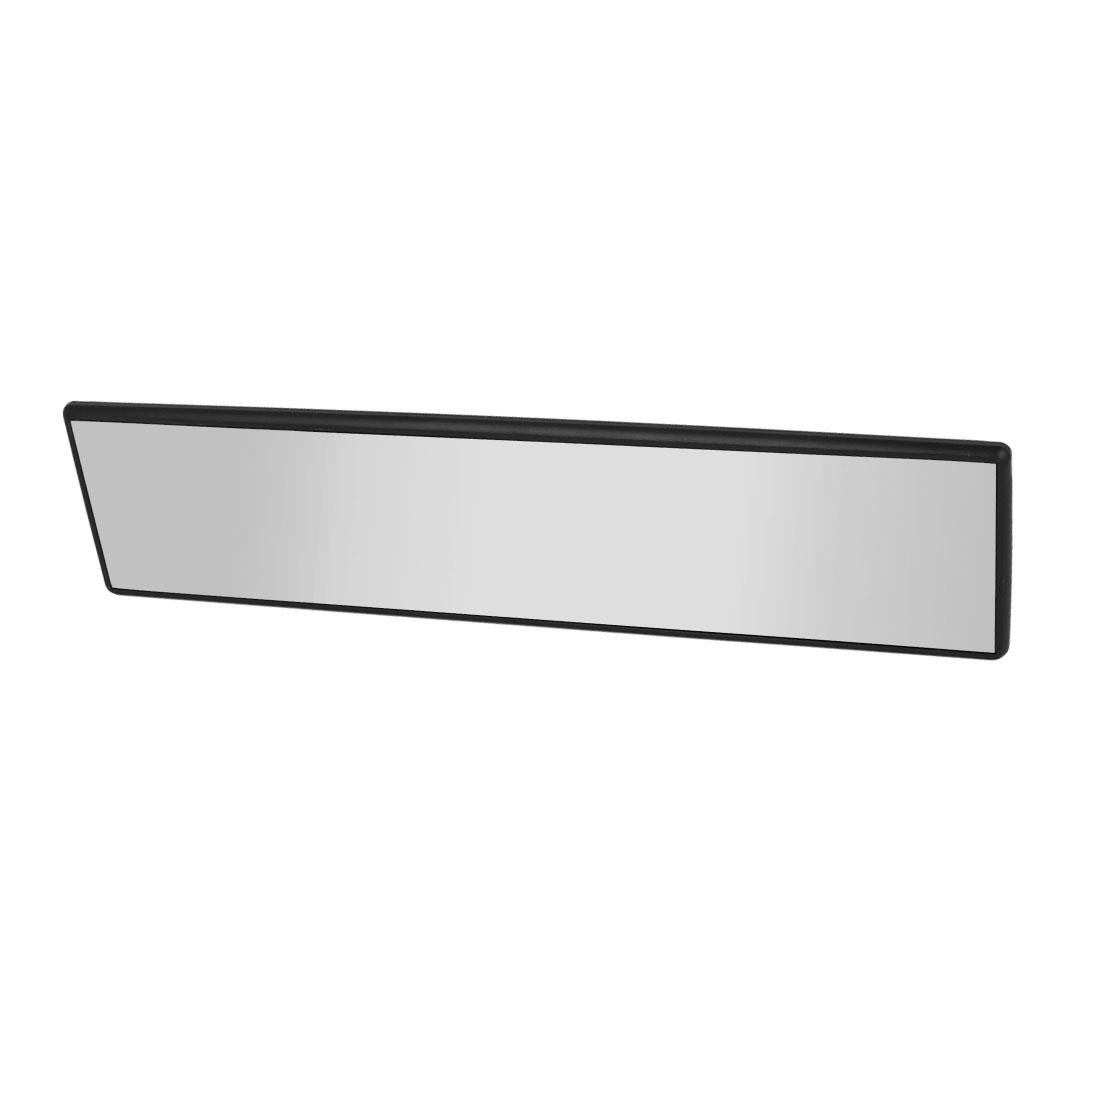 300mm x 70mm Flat Clip on Auto Car Interior Rear View Mirror Black